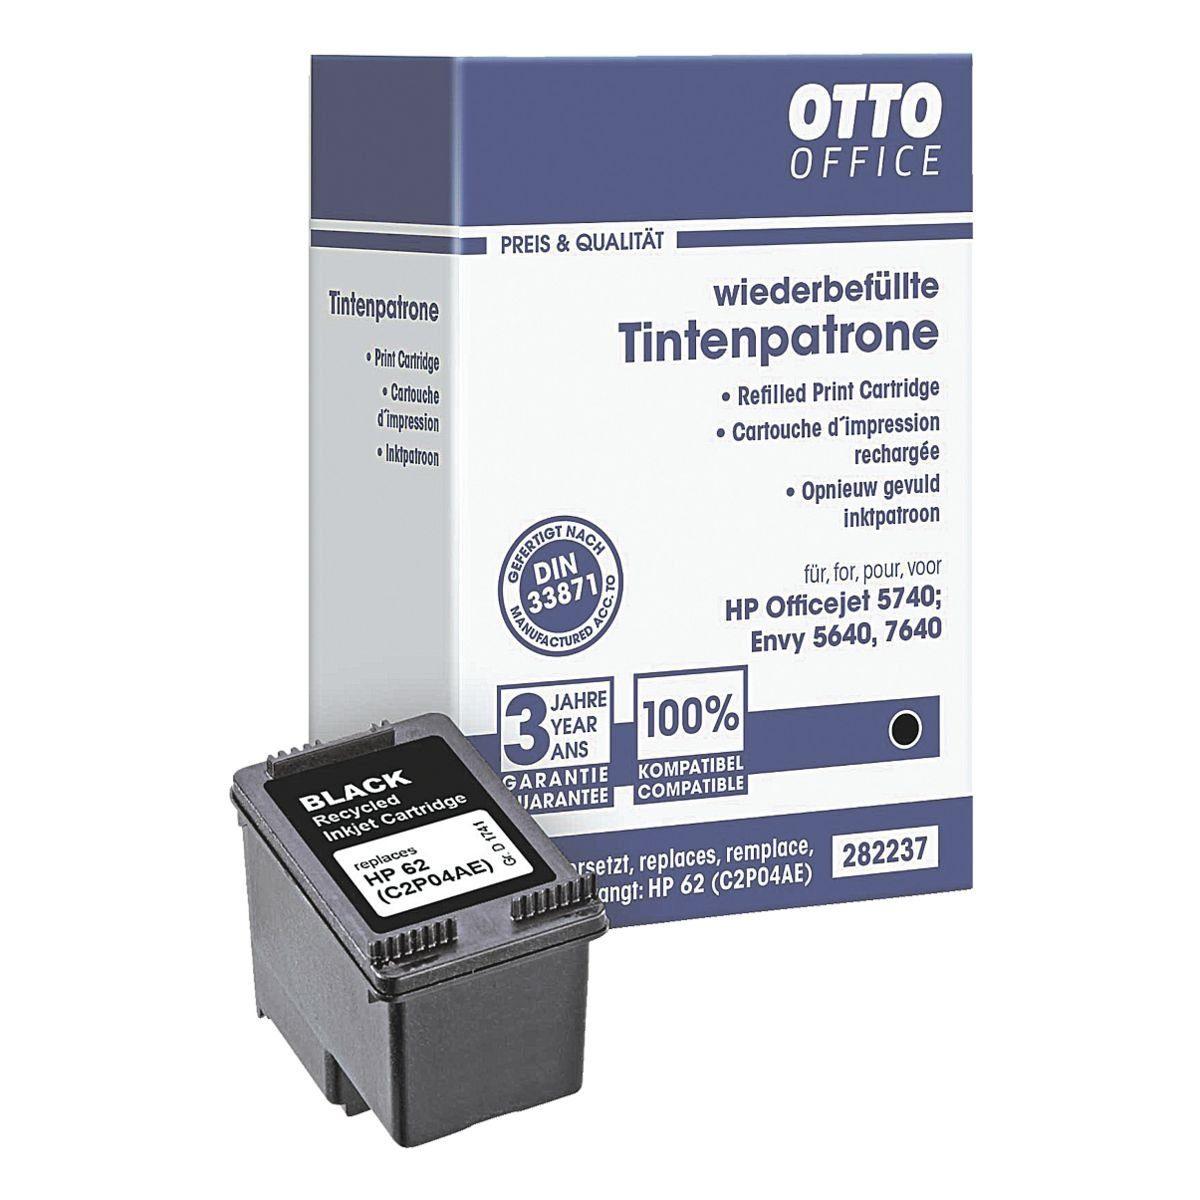 OTTO Office Tintenpatrone ersetzt HP »C2P04A« 62